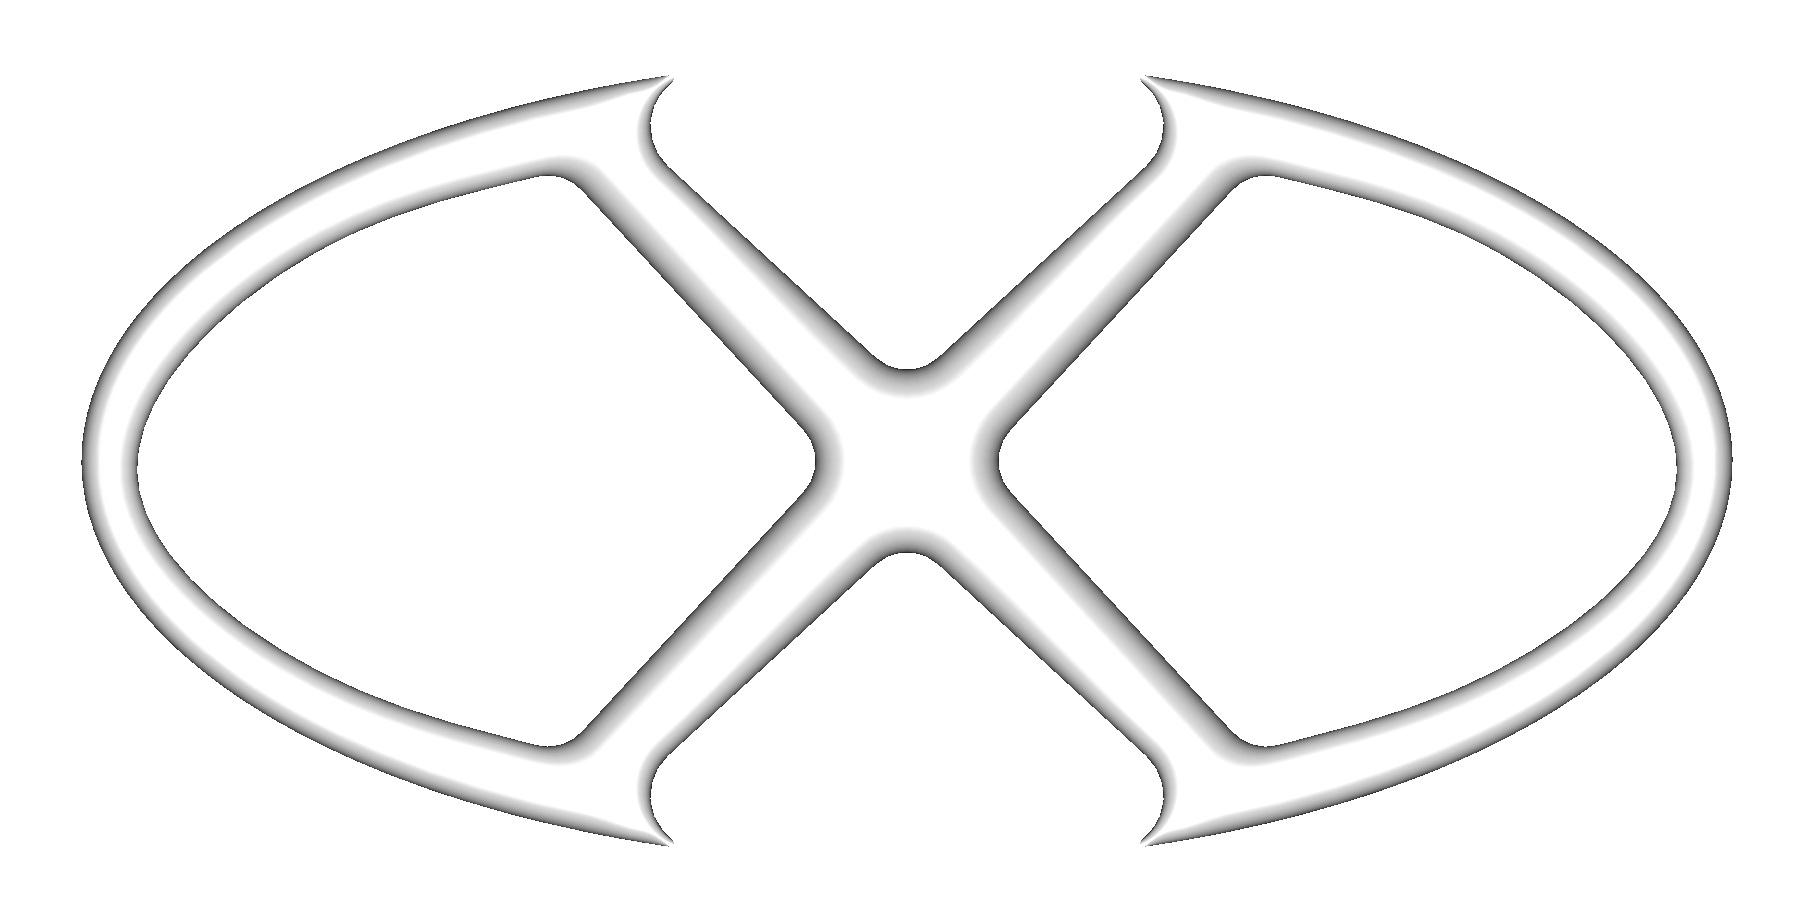 XJ Urethane Motor Mounts - Stock Fitment